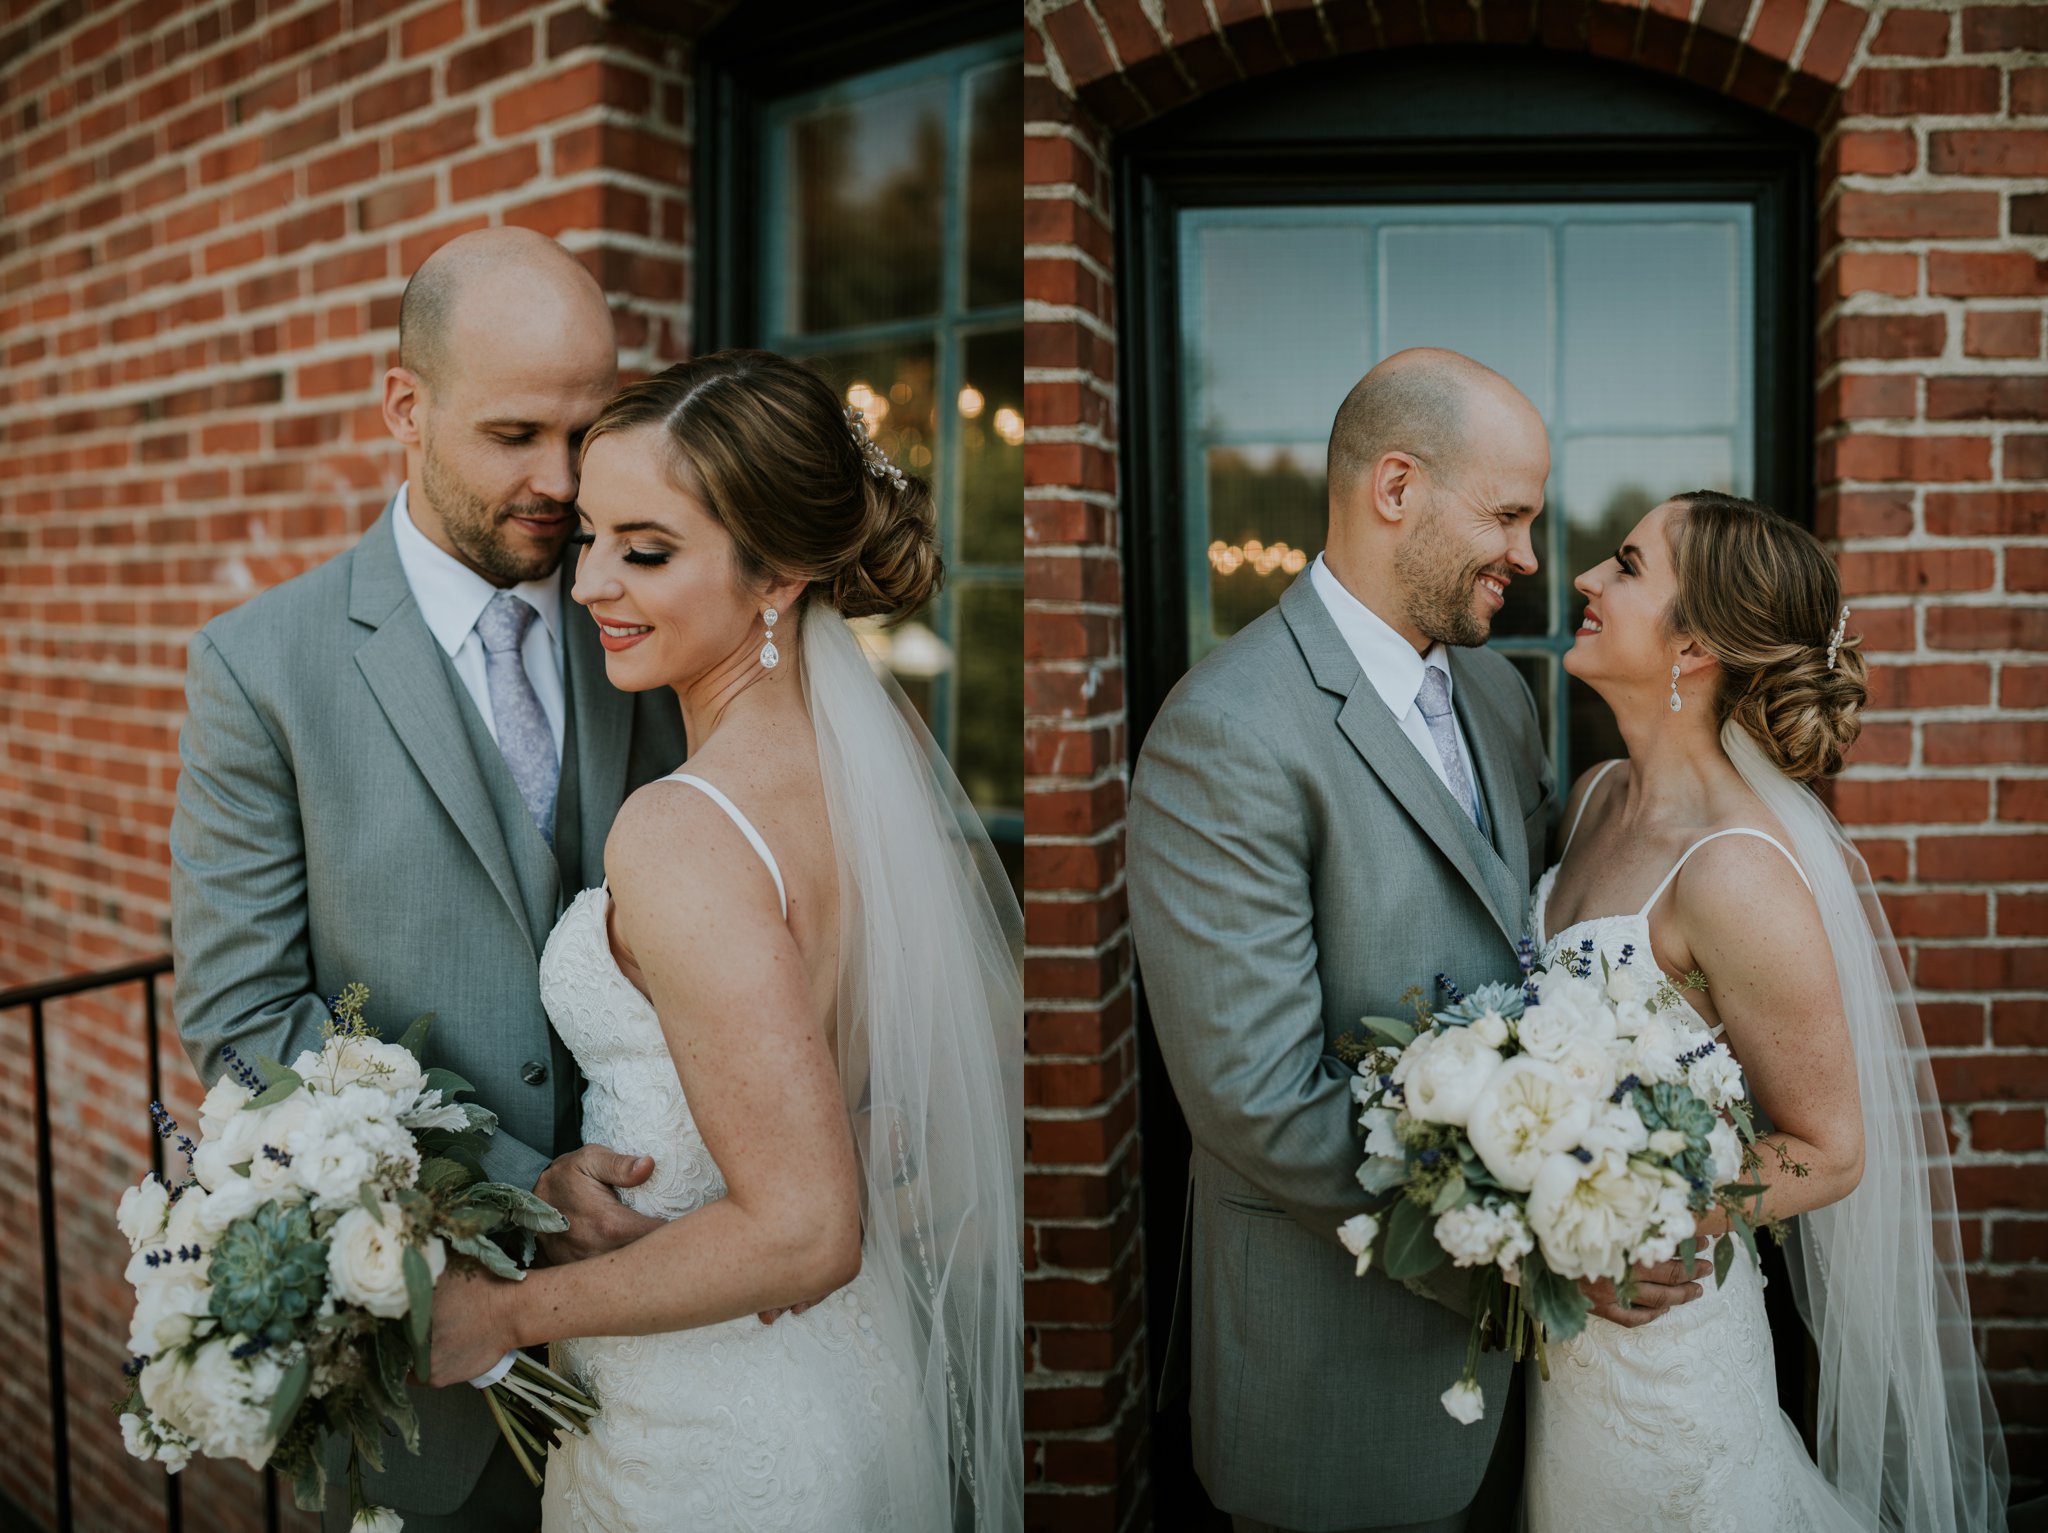 hollywood-school-house-wedding-seattle-photographer-caitlyn-nikula-49.jpg